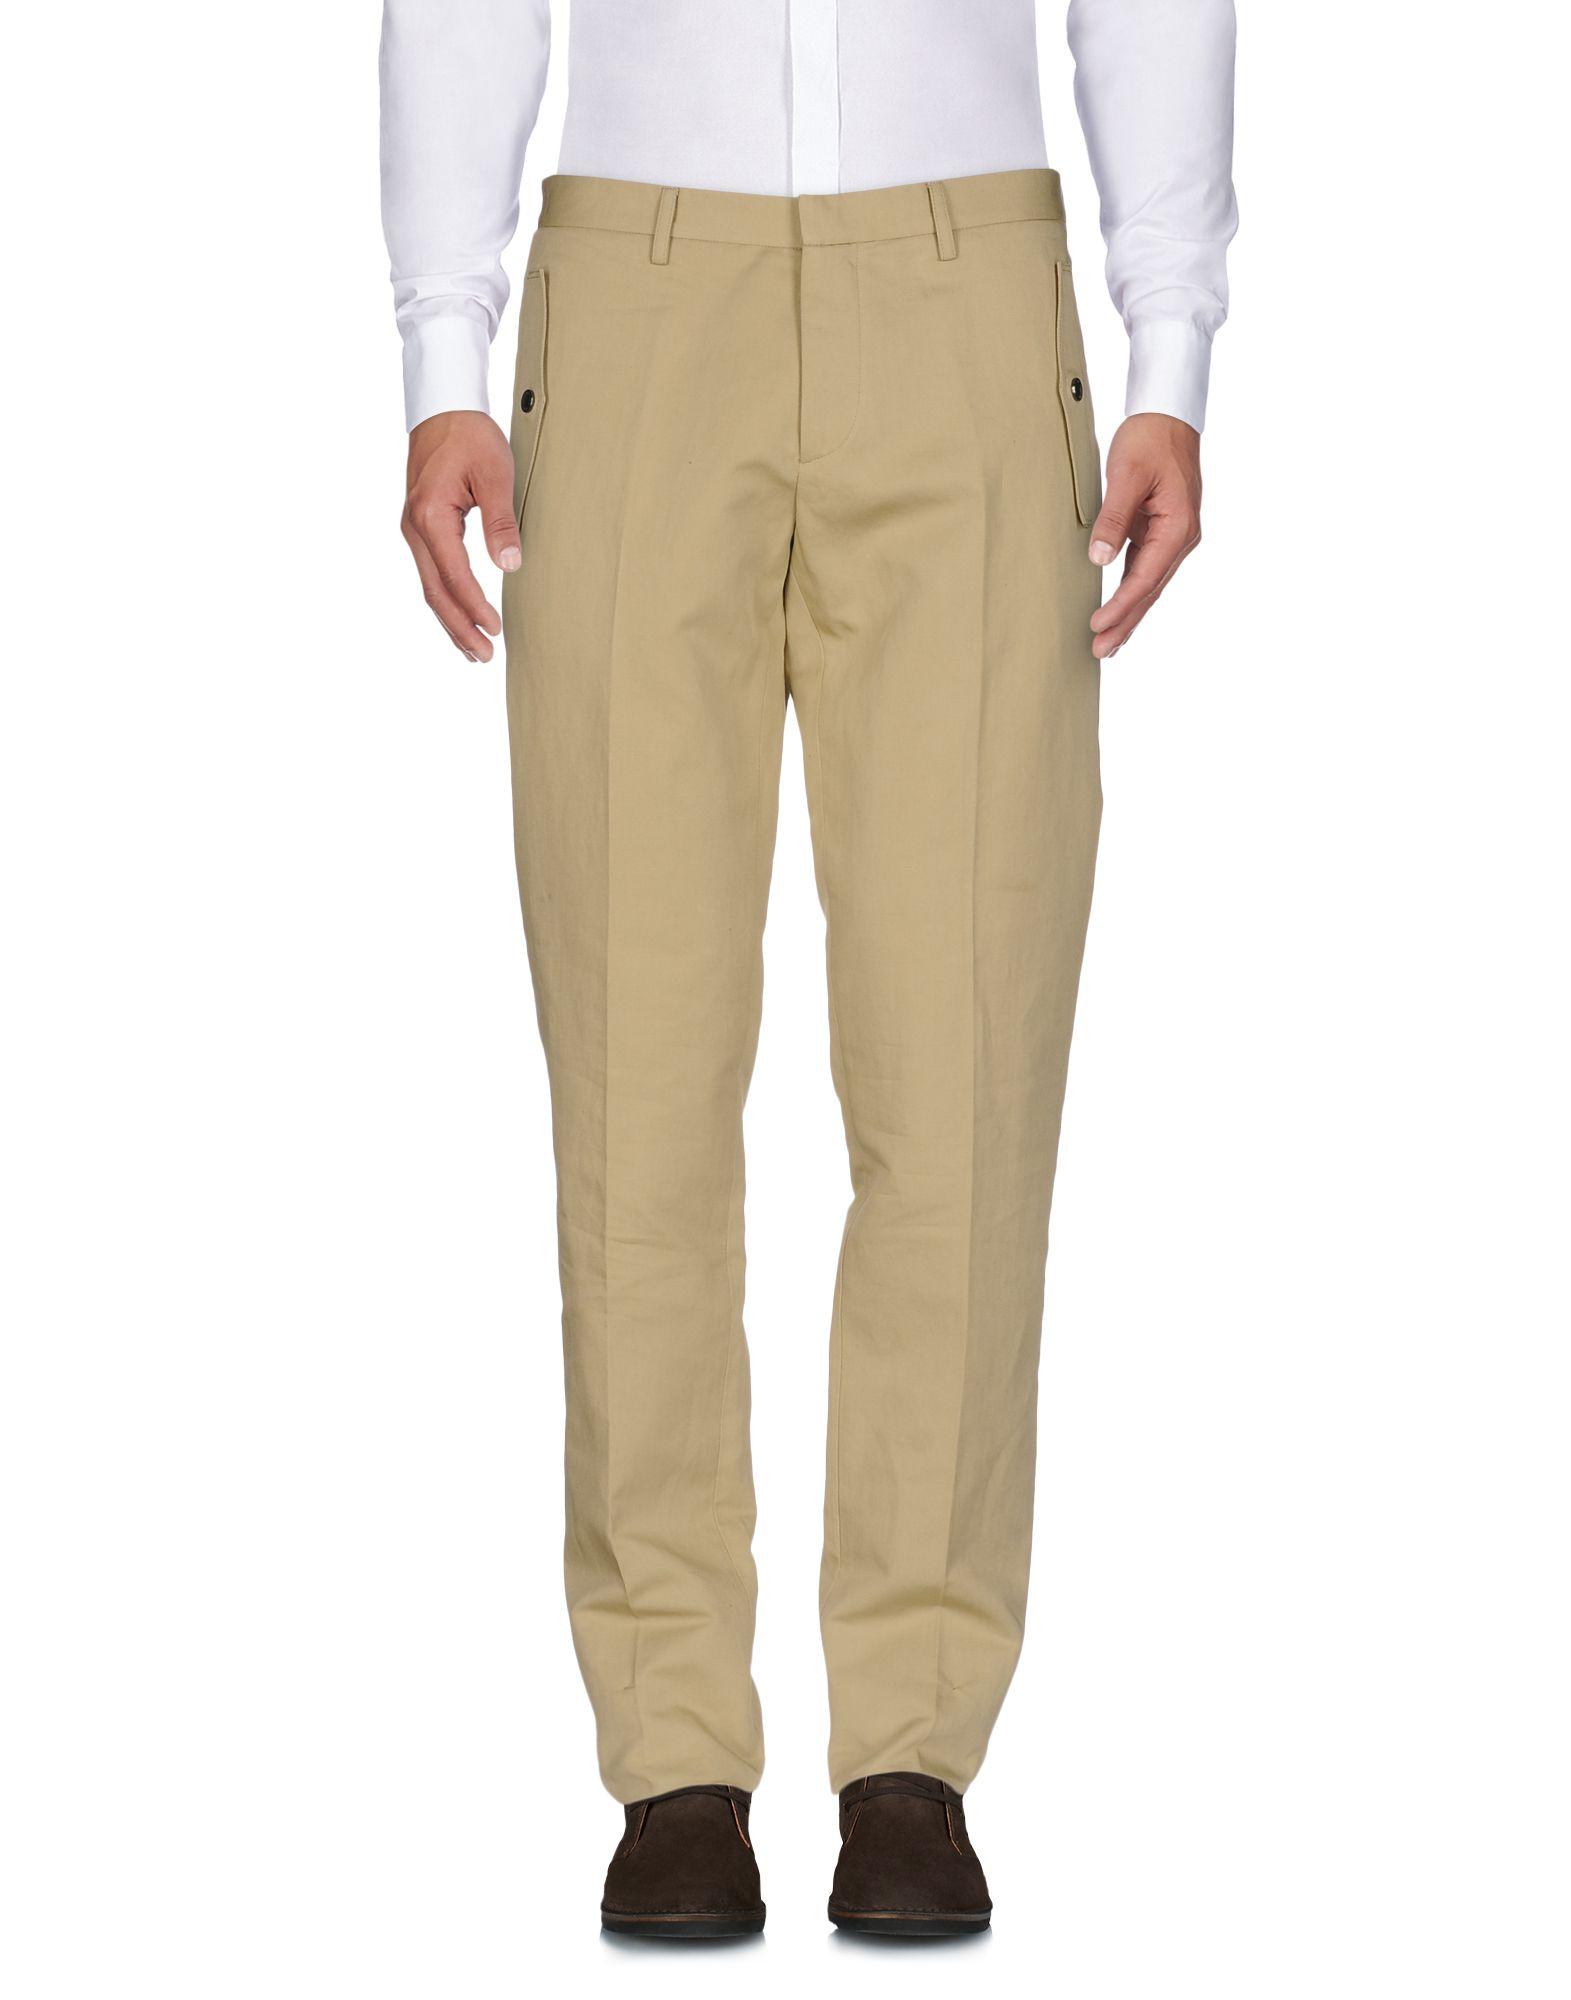 Pantalone Belstaff Uomo - Acquista online su